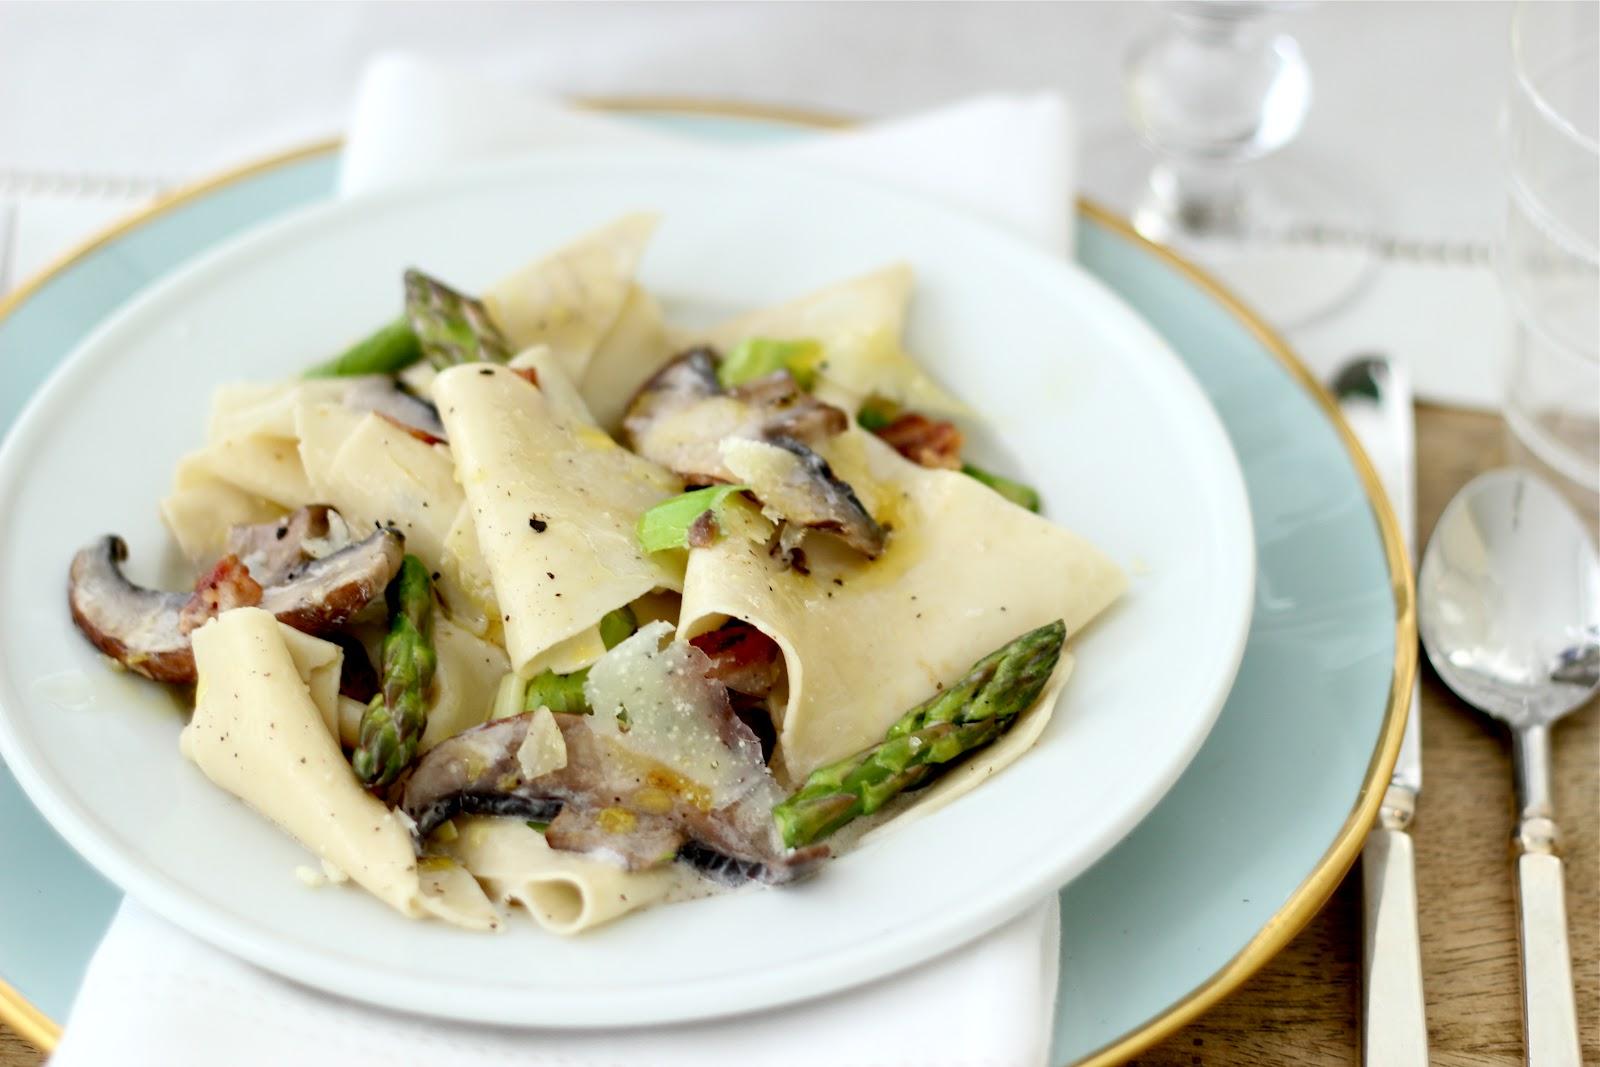 Jenny Steffens Hobick: Asparagus, Mushroom & Leek Spring Pasta